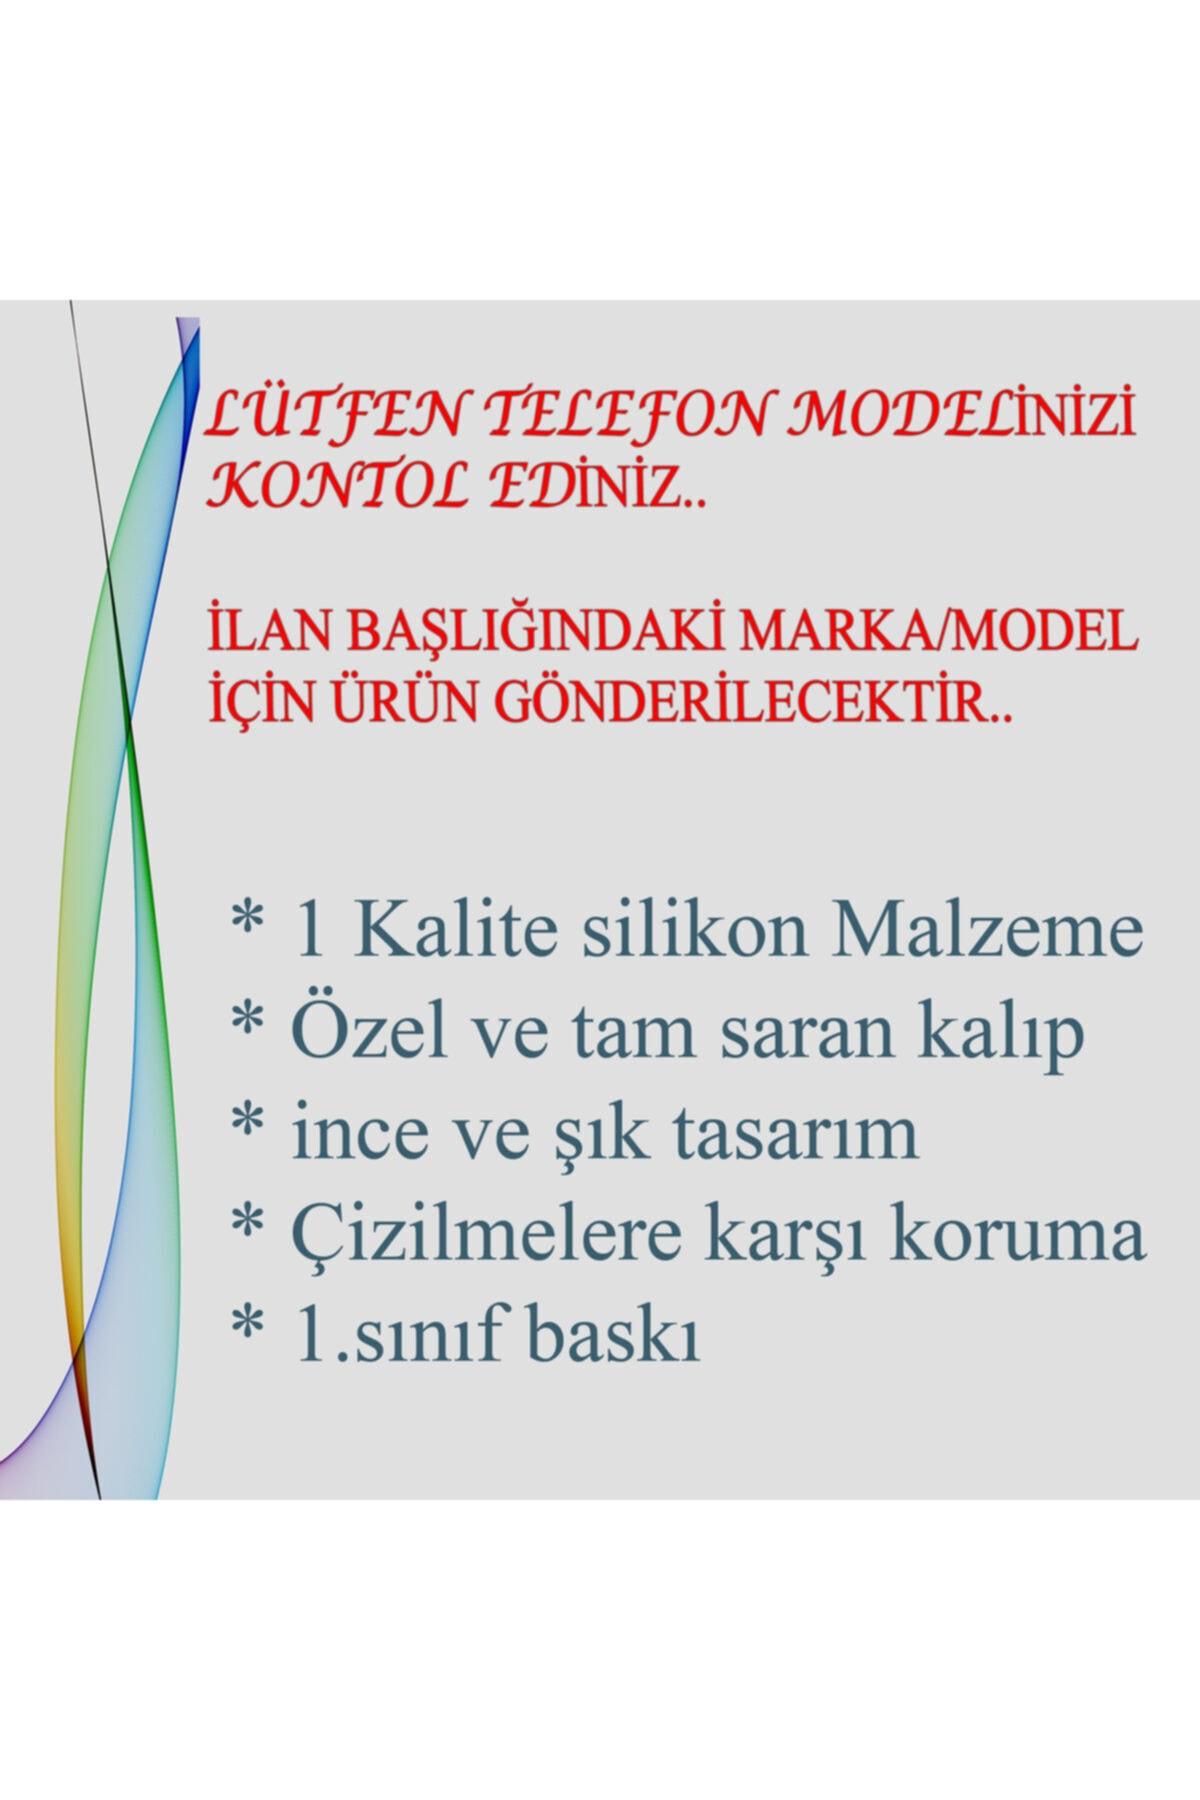 Zipax Iphone Xs Max Kılıf 2